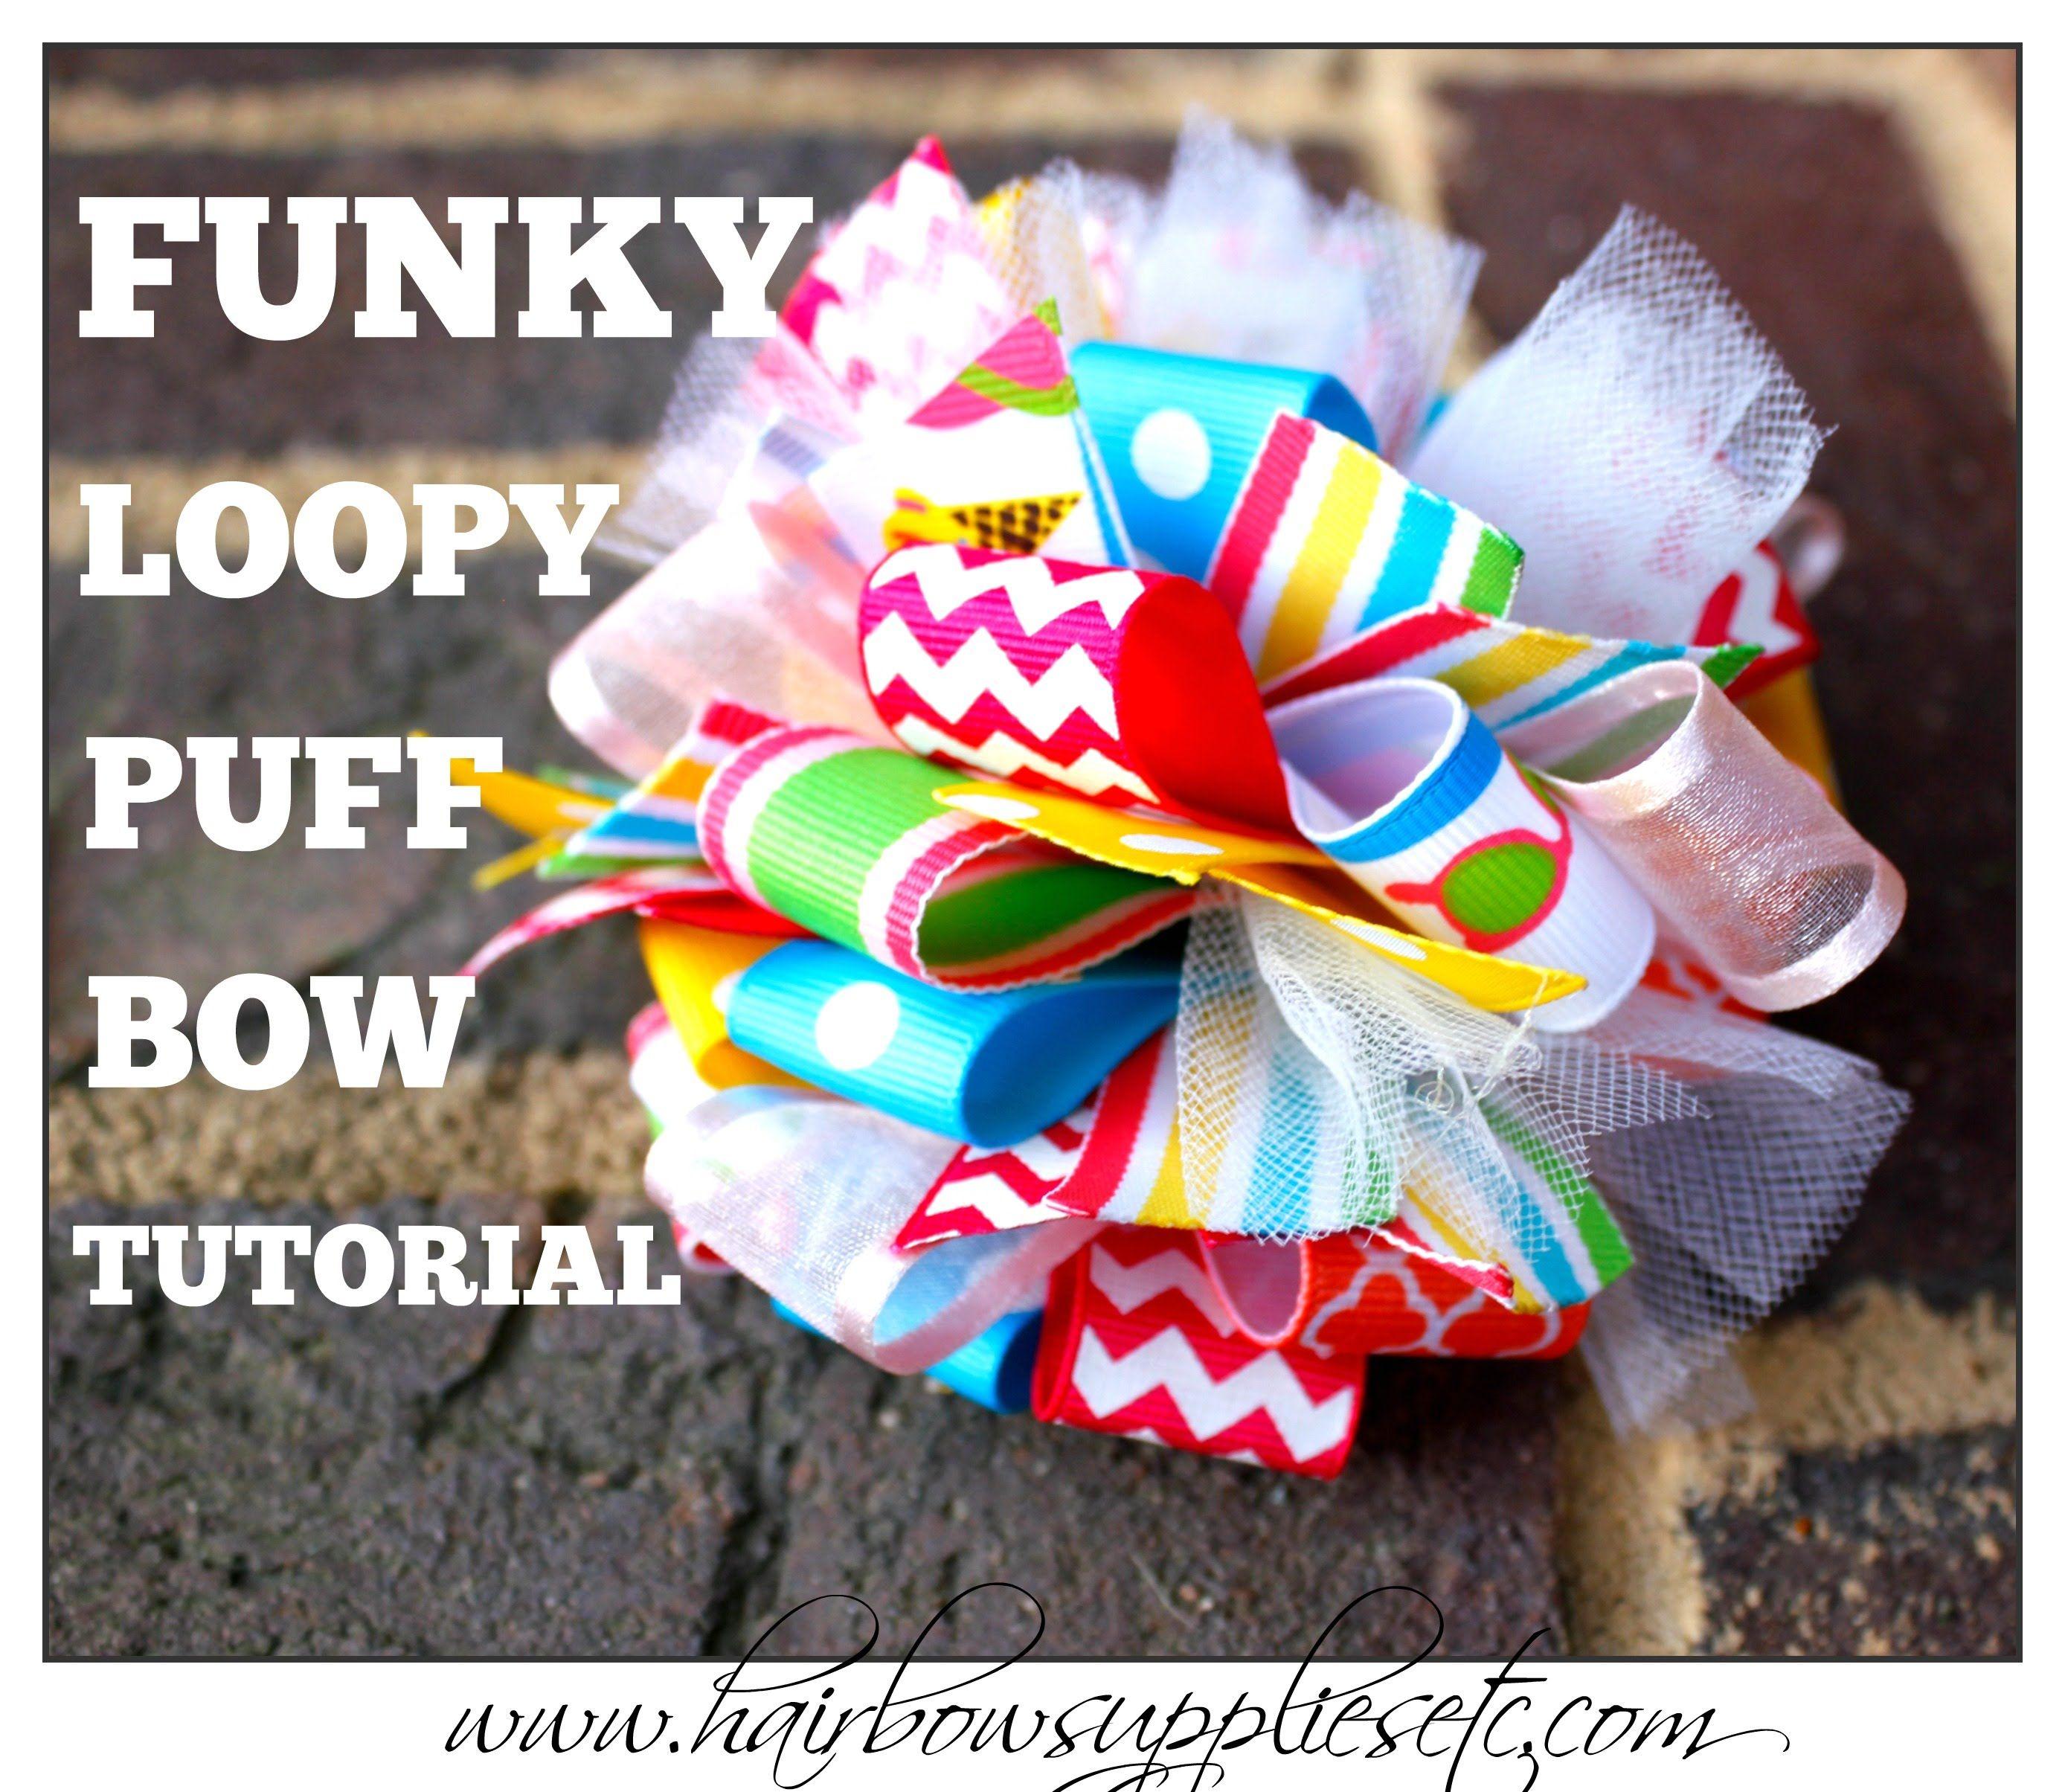 Funky Loopy Puff Bow Tutorial - Hair Bow Tutorial - DIY hair bow - How to make a hair bow Hairbow Supplies, Etc. #hairbows